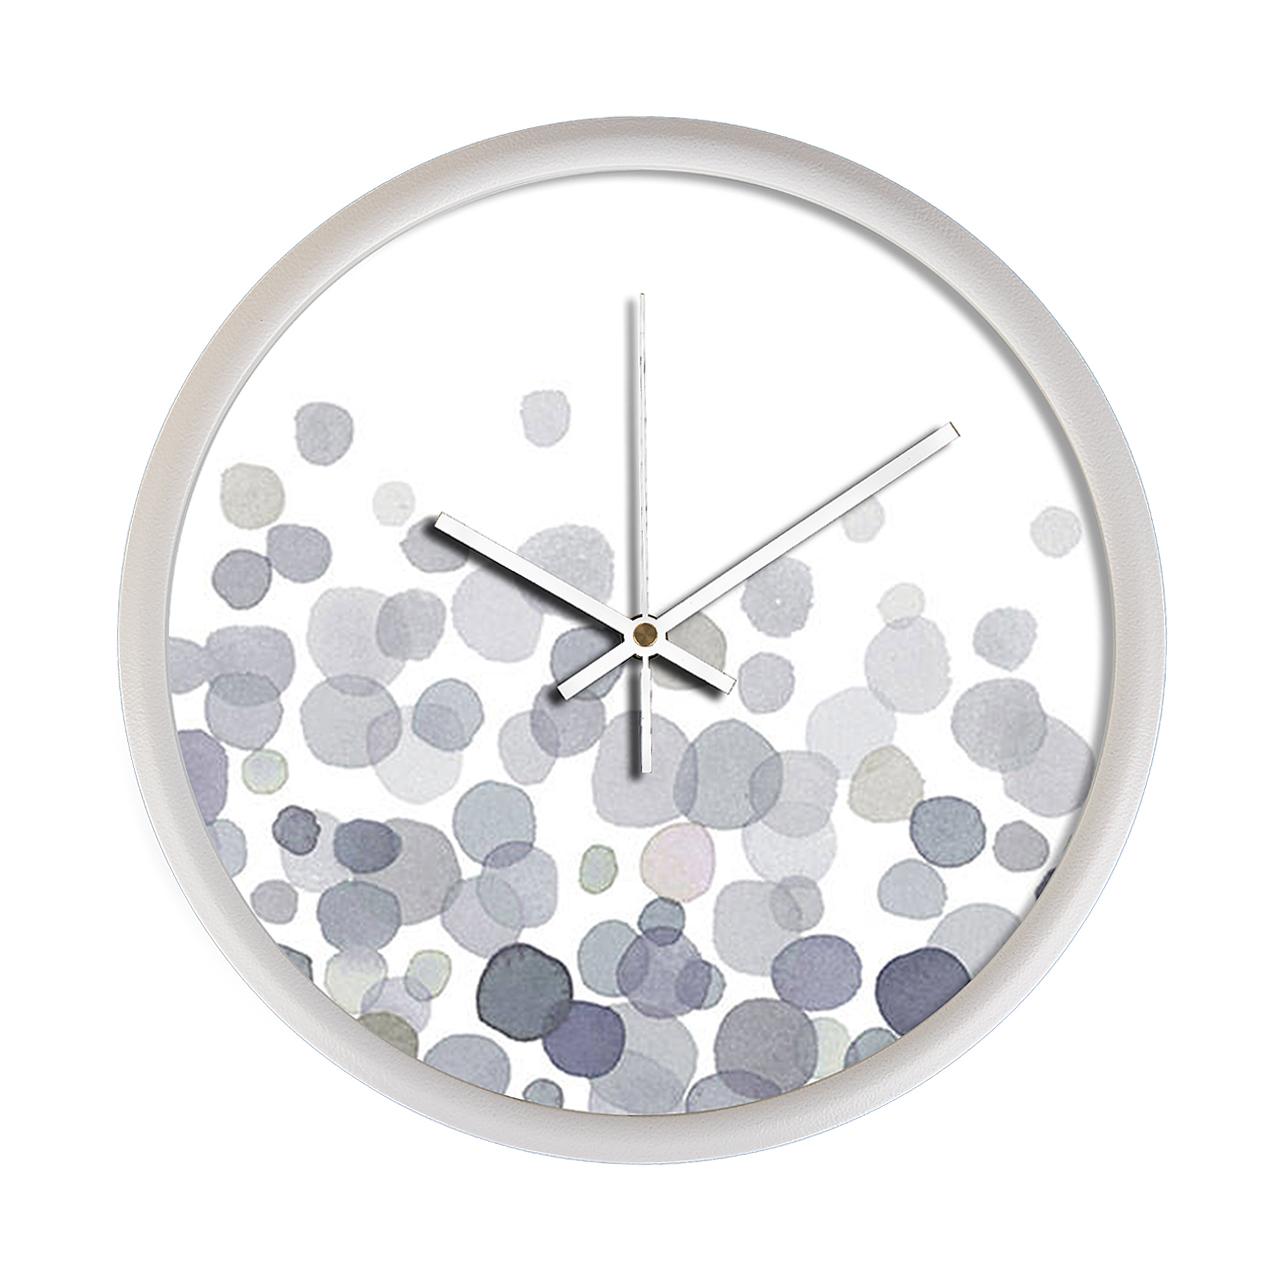 ساعت دیواری مینی مال لاکچری مدل 35Dio3_0548